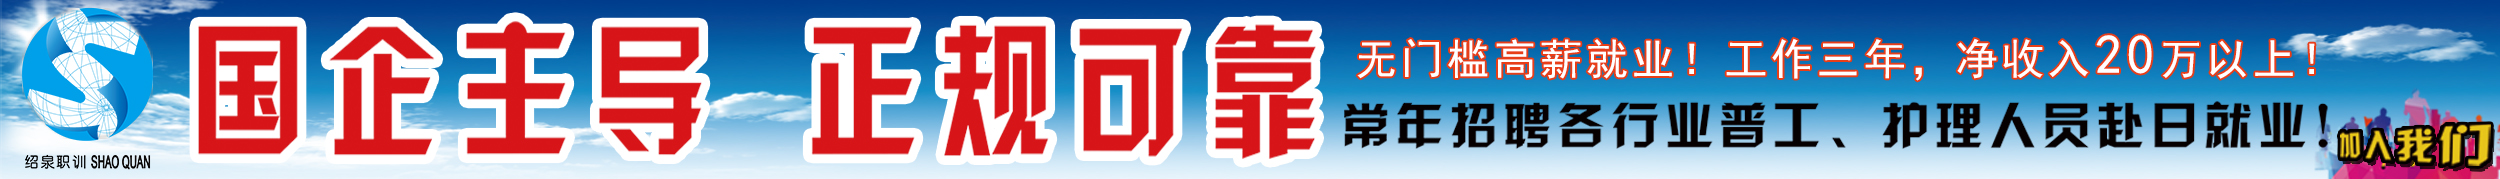 �B泉��I教育培�服�眨ㄅR泉)有限公司